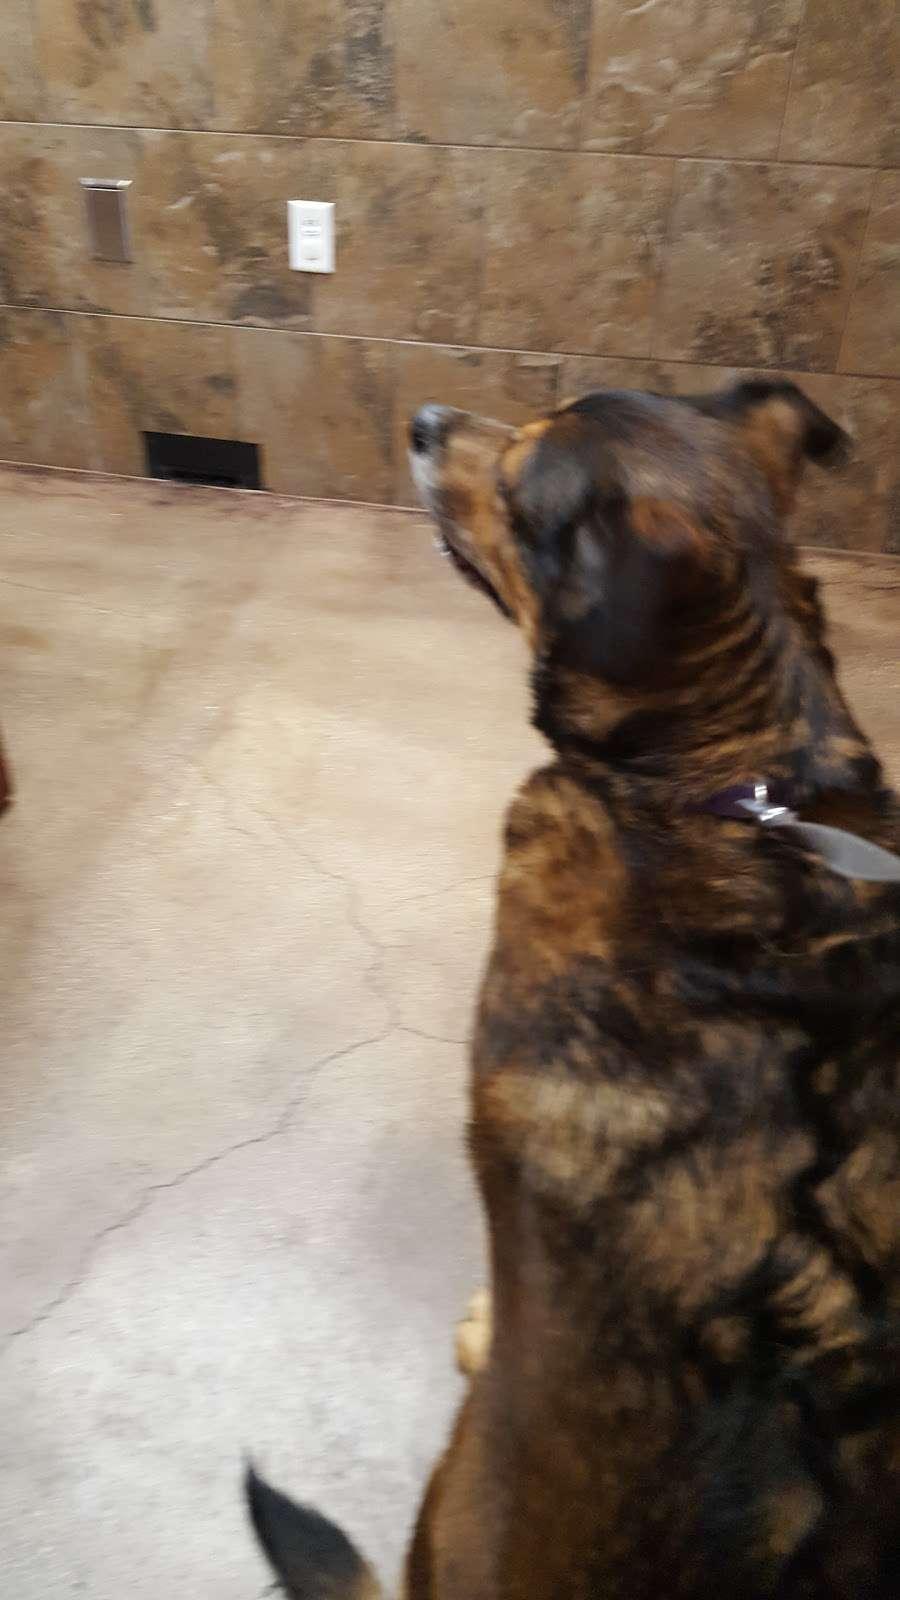 DeZavala-Shavano Veterinary Clinic - veterinary care  | Photo 6 of 10 | Address: 4408 Lockhill Selma Rd, San Antonio, TX 78249, USA | Phone: (210) 699-3939